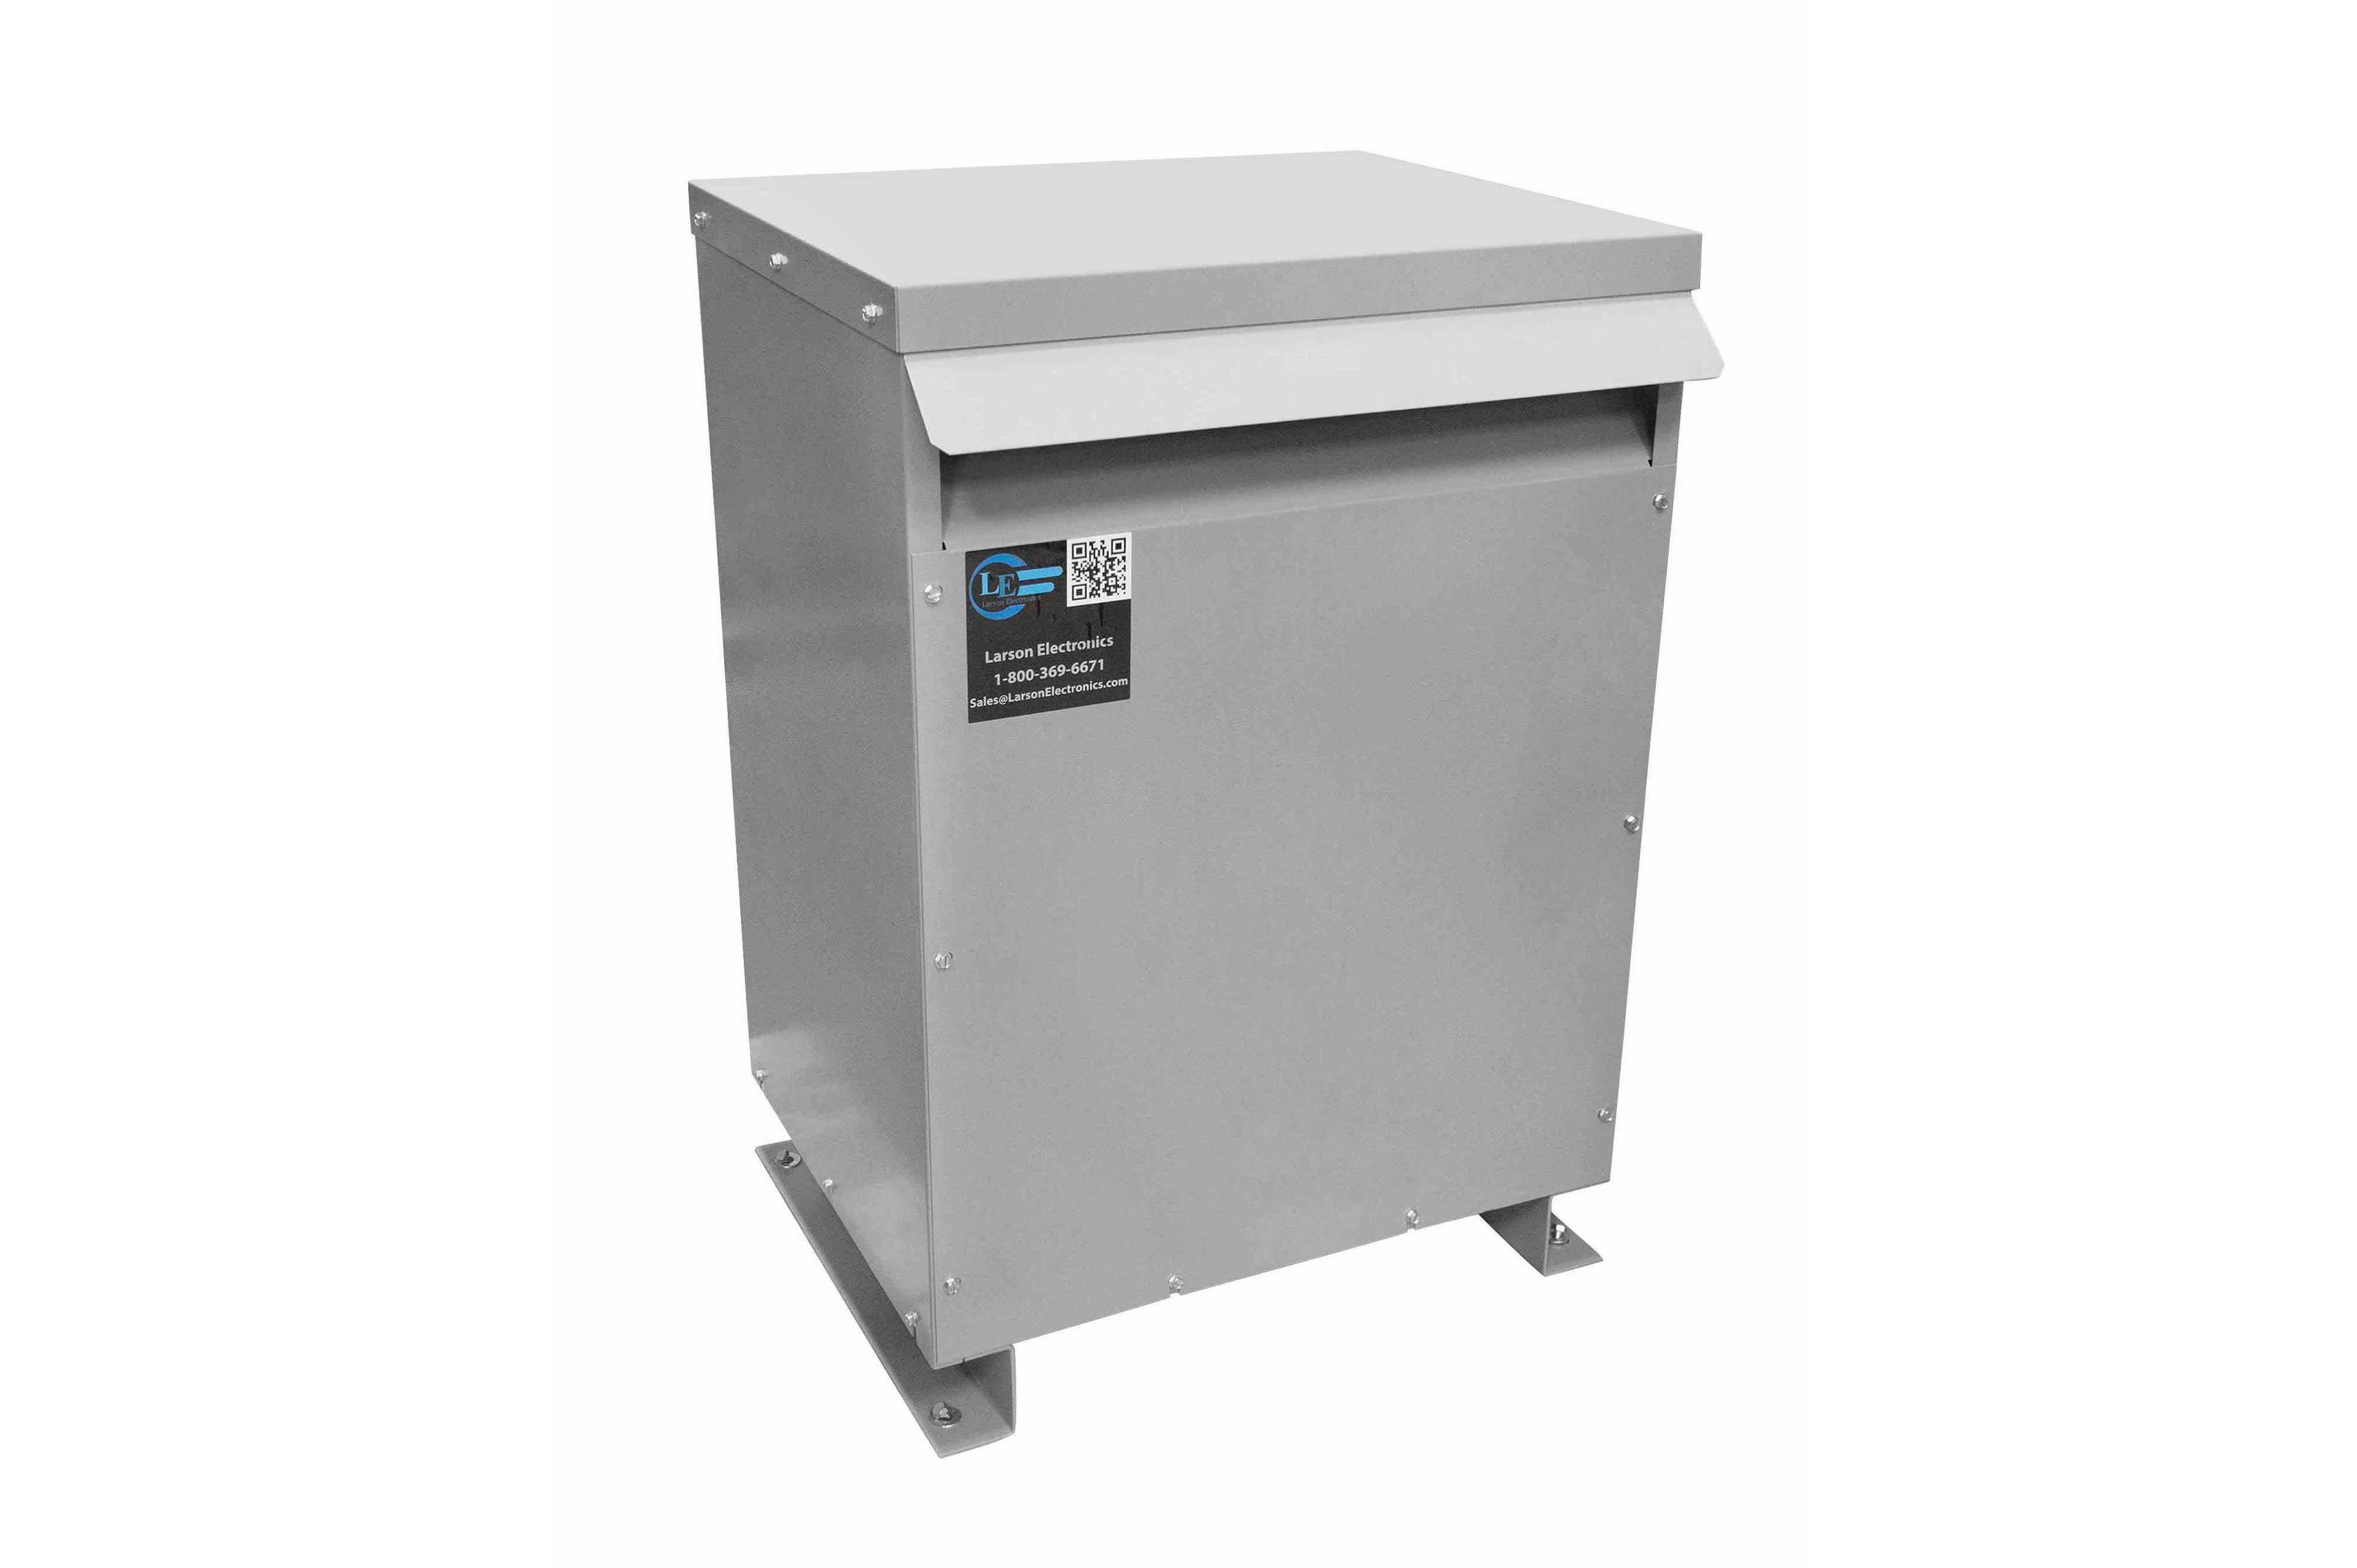 9 kVA 3PH Isolation Transformer, 415V Wye Primary, 240V/120 Delta Secondary, N3R, Ventilated, 60 Hz